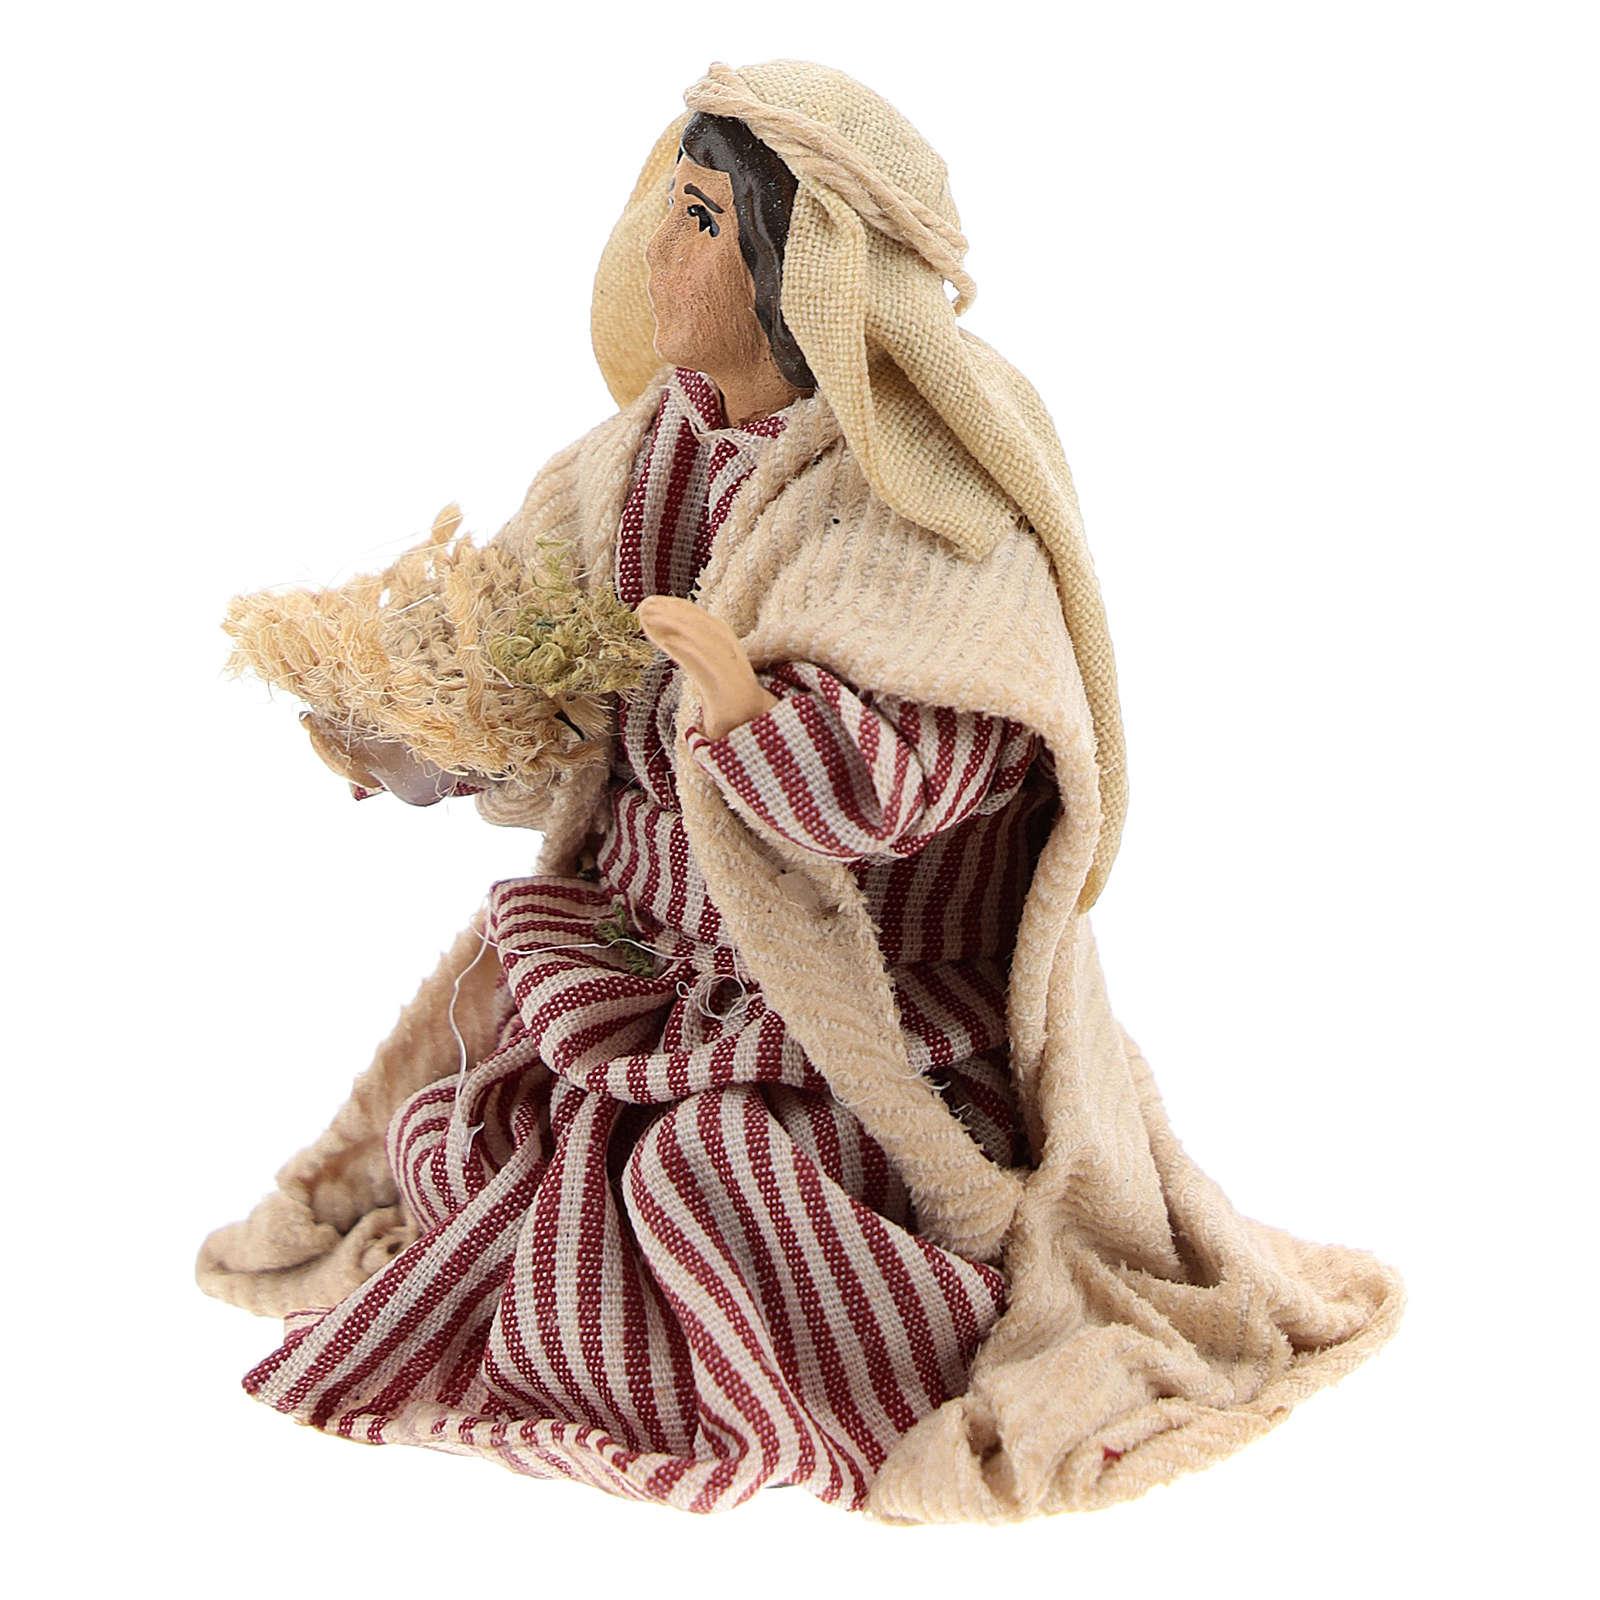 Neapolitan Nativity figurine, Kneeling beggar 8cm 4